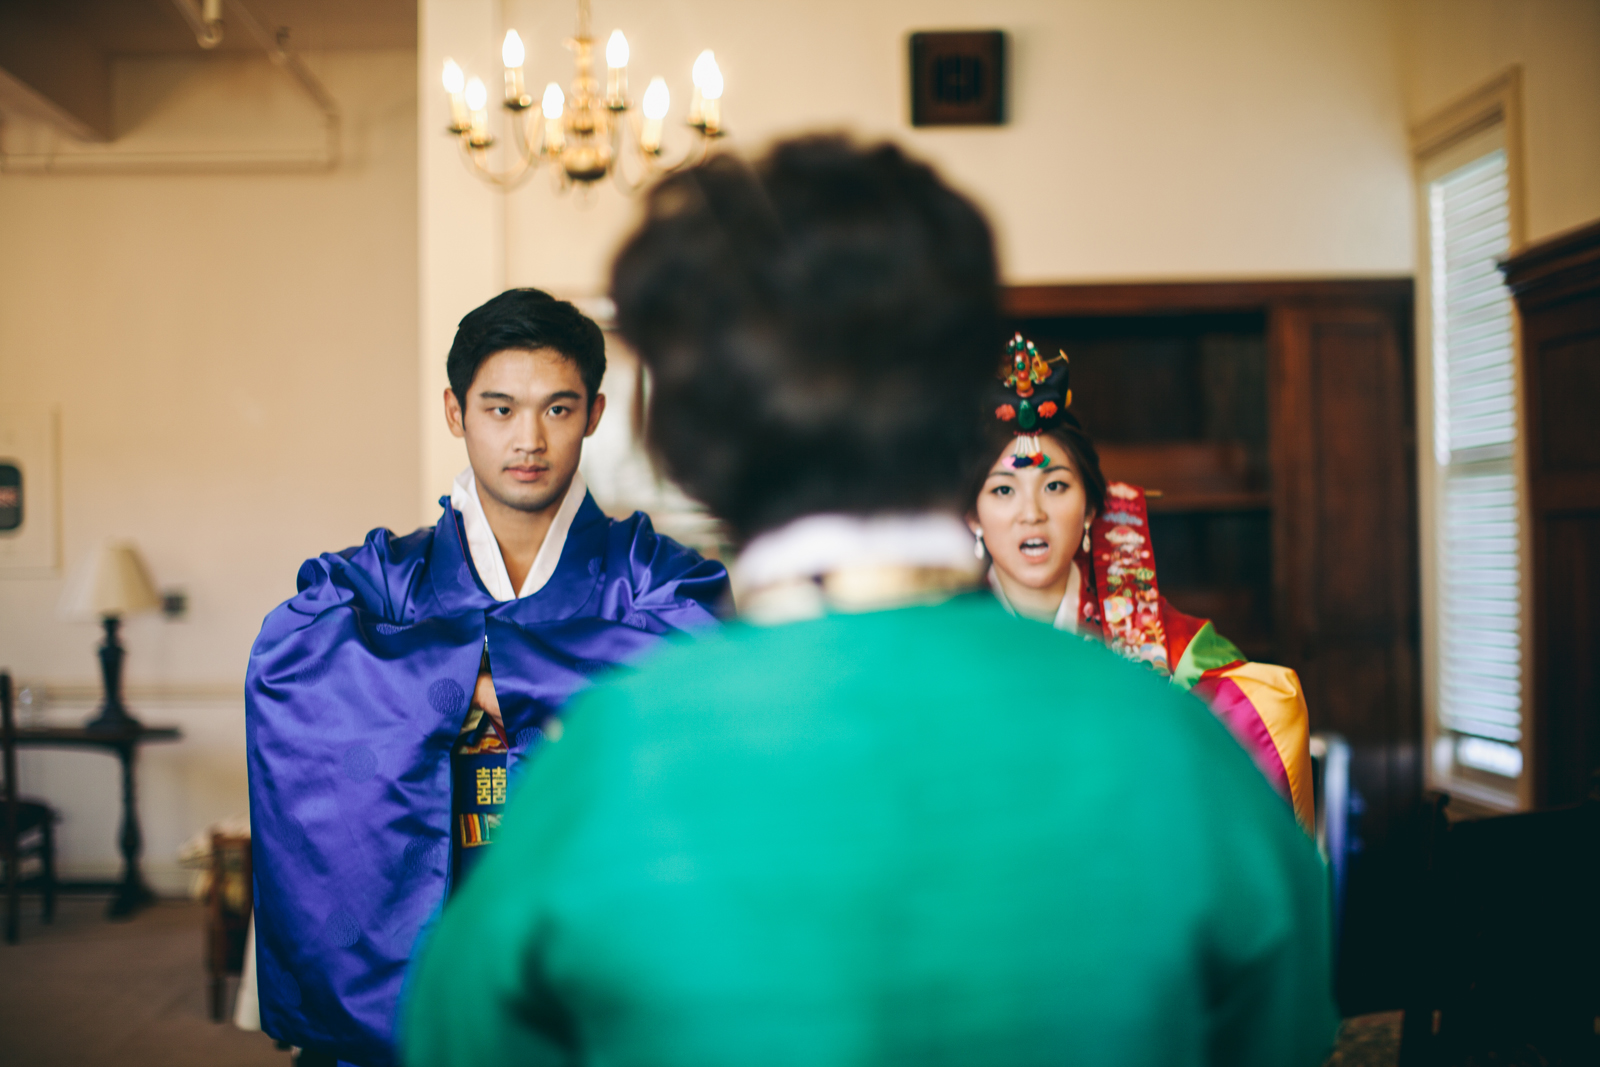 kohl_manison_wedding_photography_sarah_eric_ebony_siovhan_bokeh_photography_054.jpg